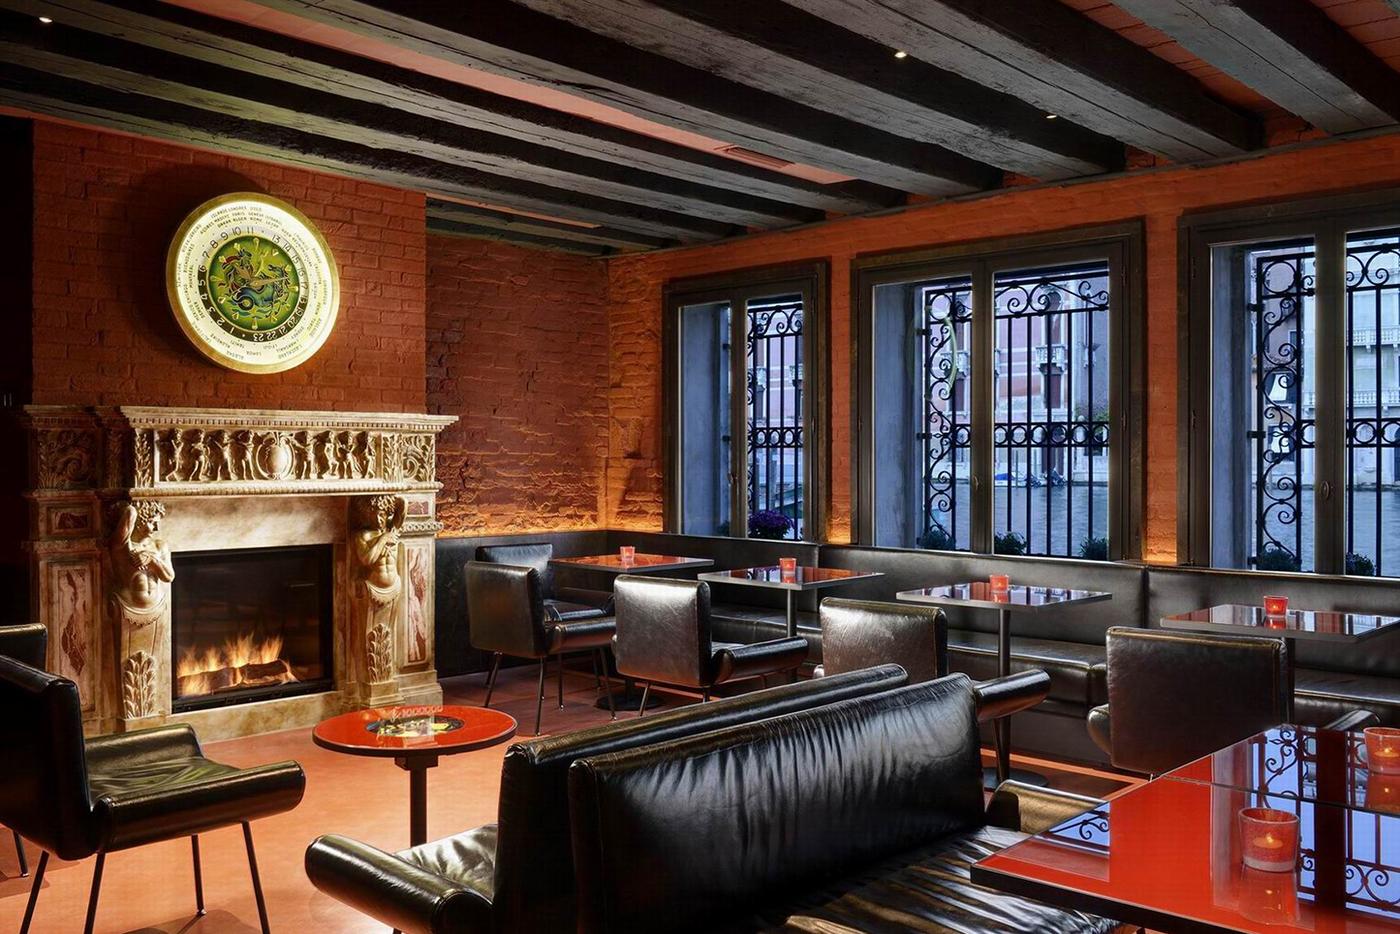 hotel l 39 orologio fabbri services italy. Black Bedroom Furniture Sets. Home Design Ideas